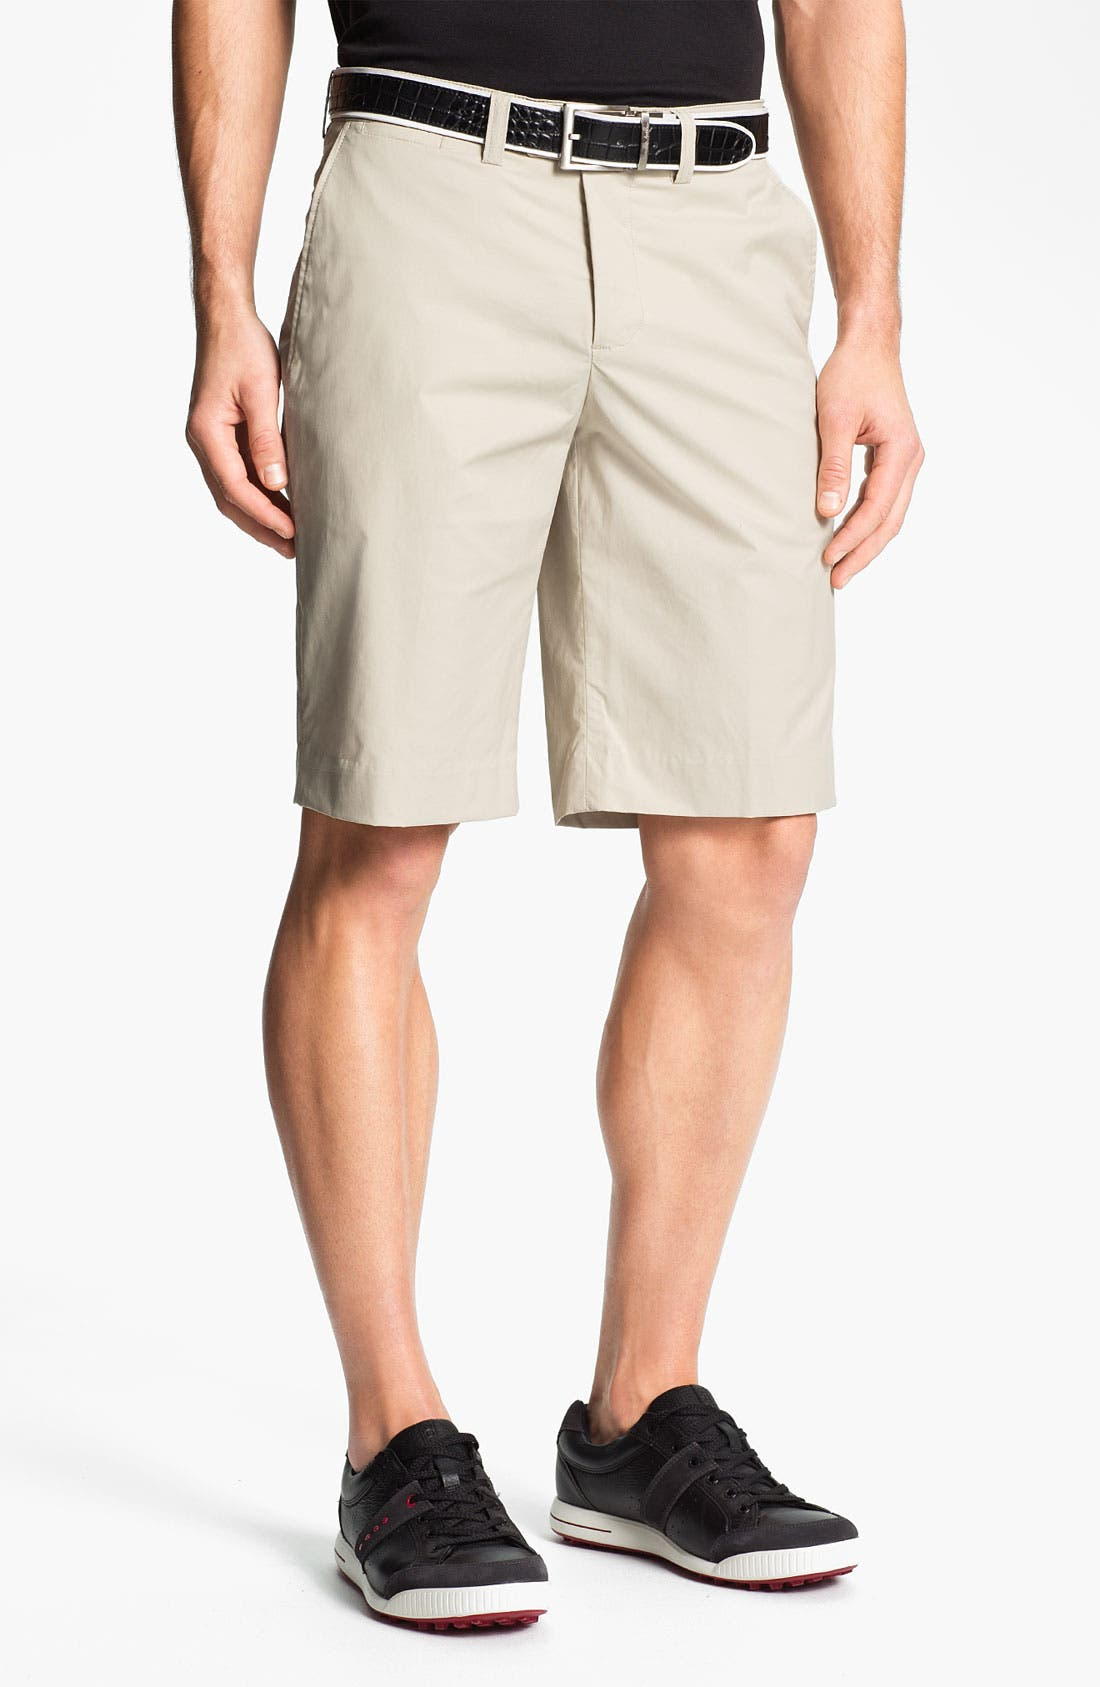 Main Image - Aquascutum Golf 'Mash' Golf Shorts (Online Only)